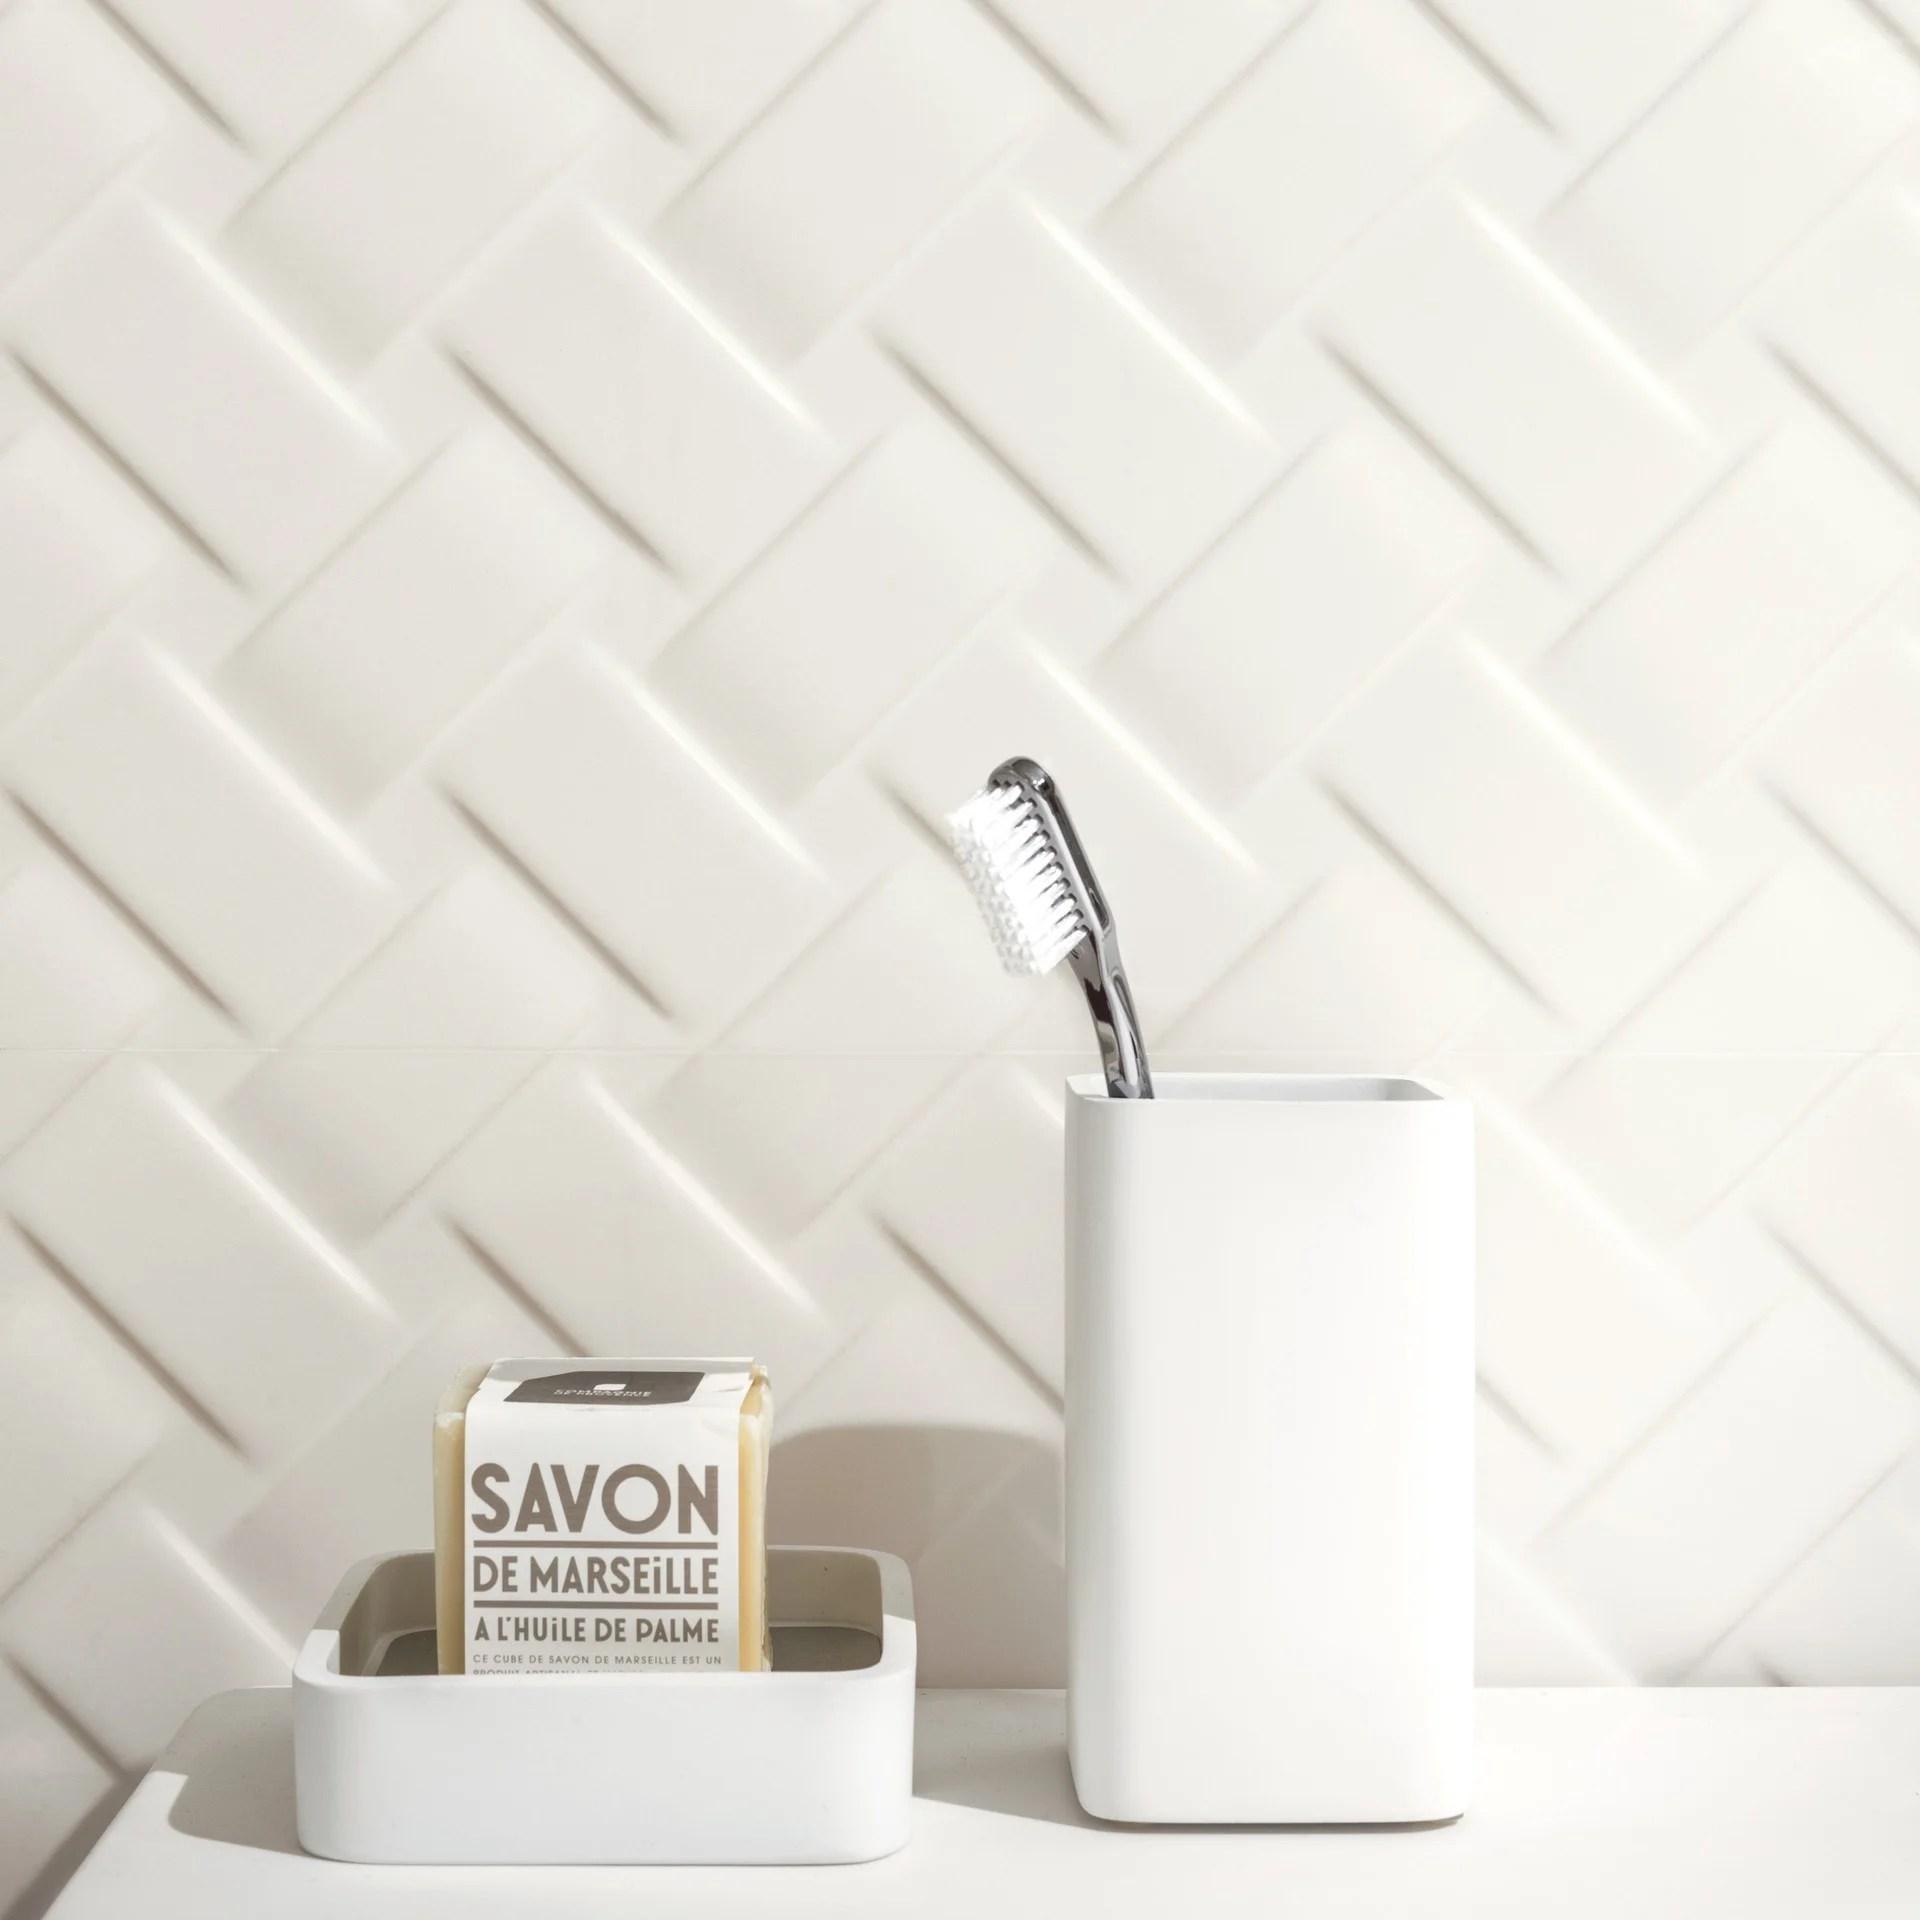 carrelage mur relief blanc mat l 25 x l 75 cm metrochic metropaper 3d leroy merlin